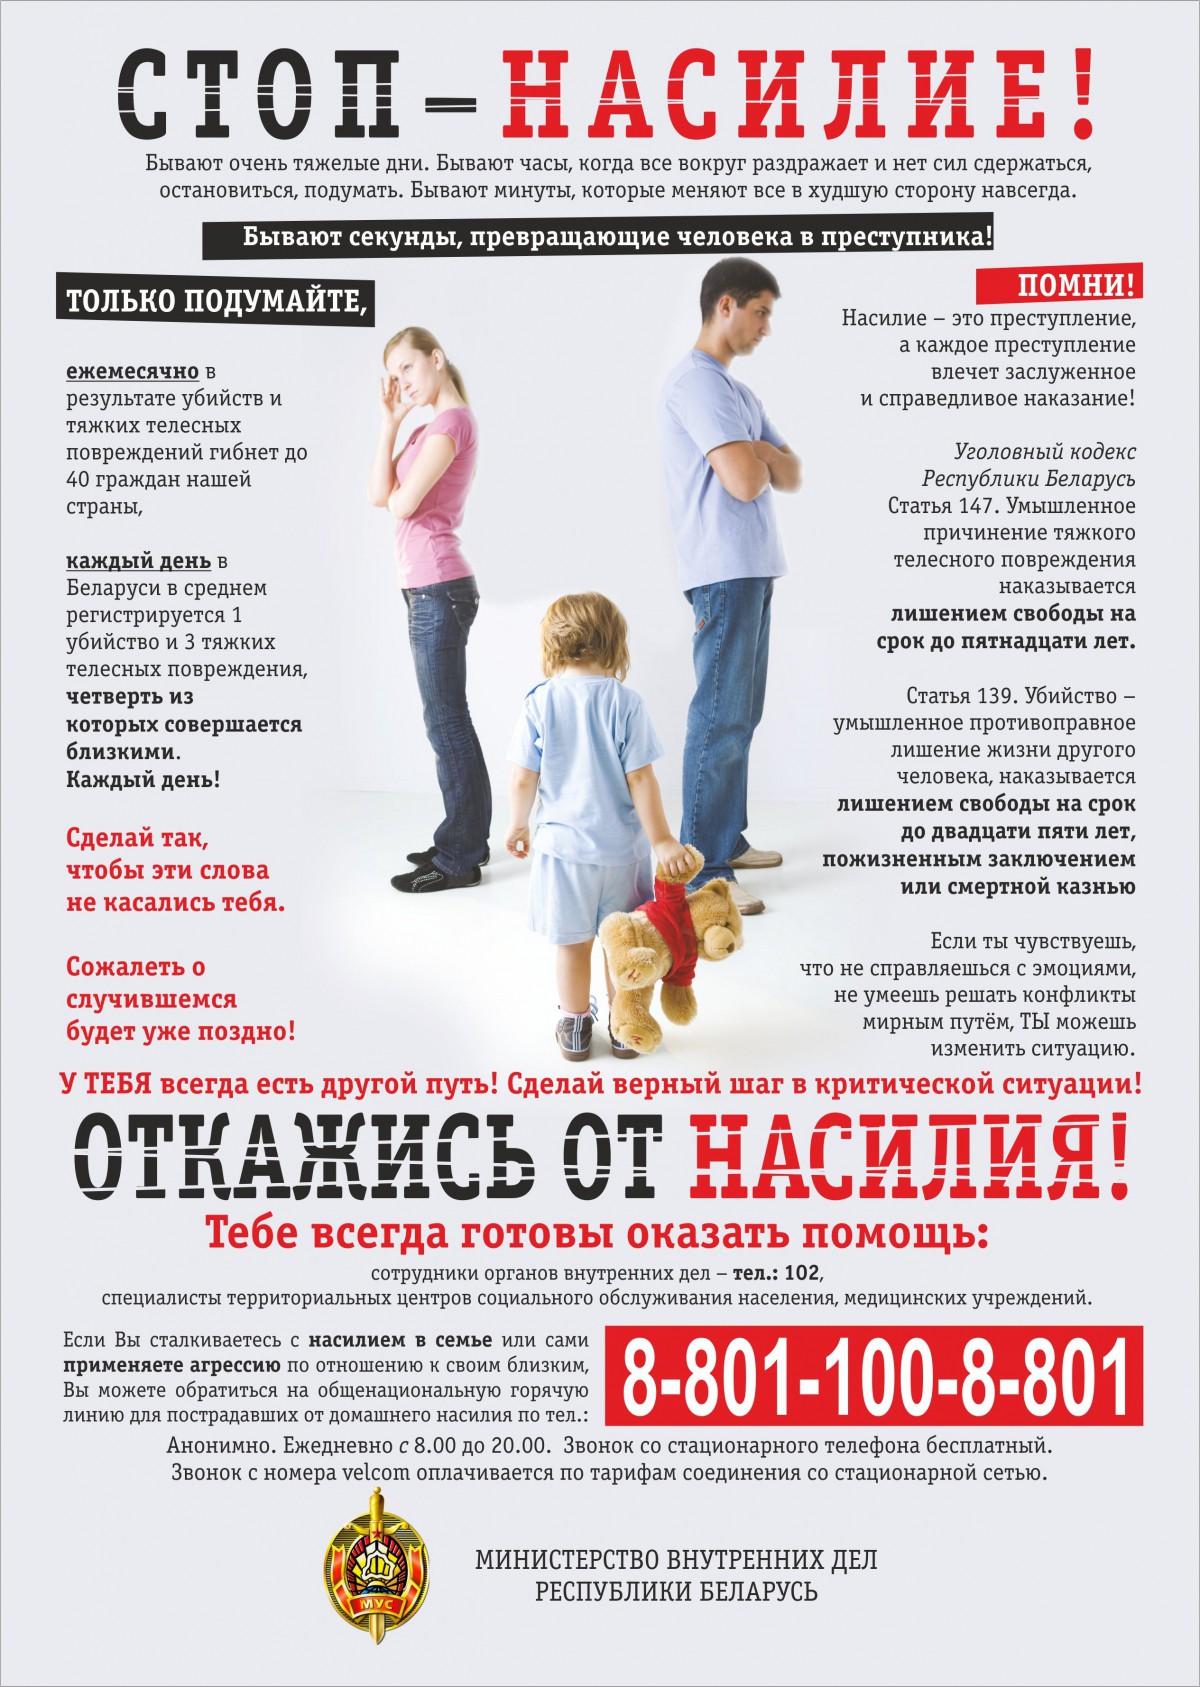 hello_html_m15599249.jpg